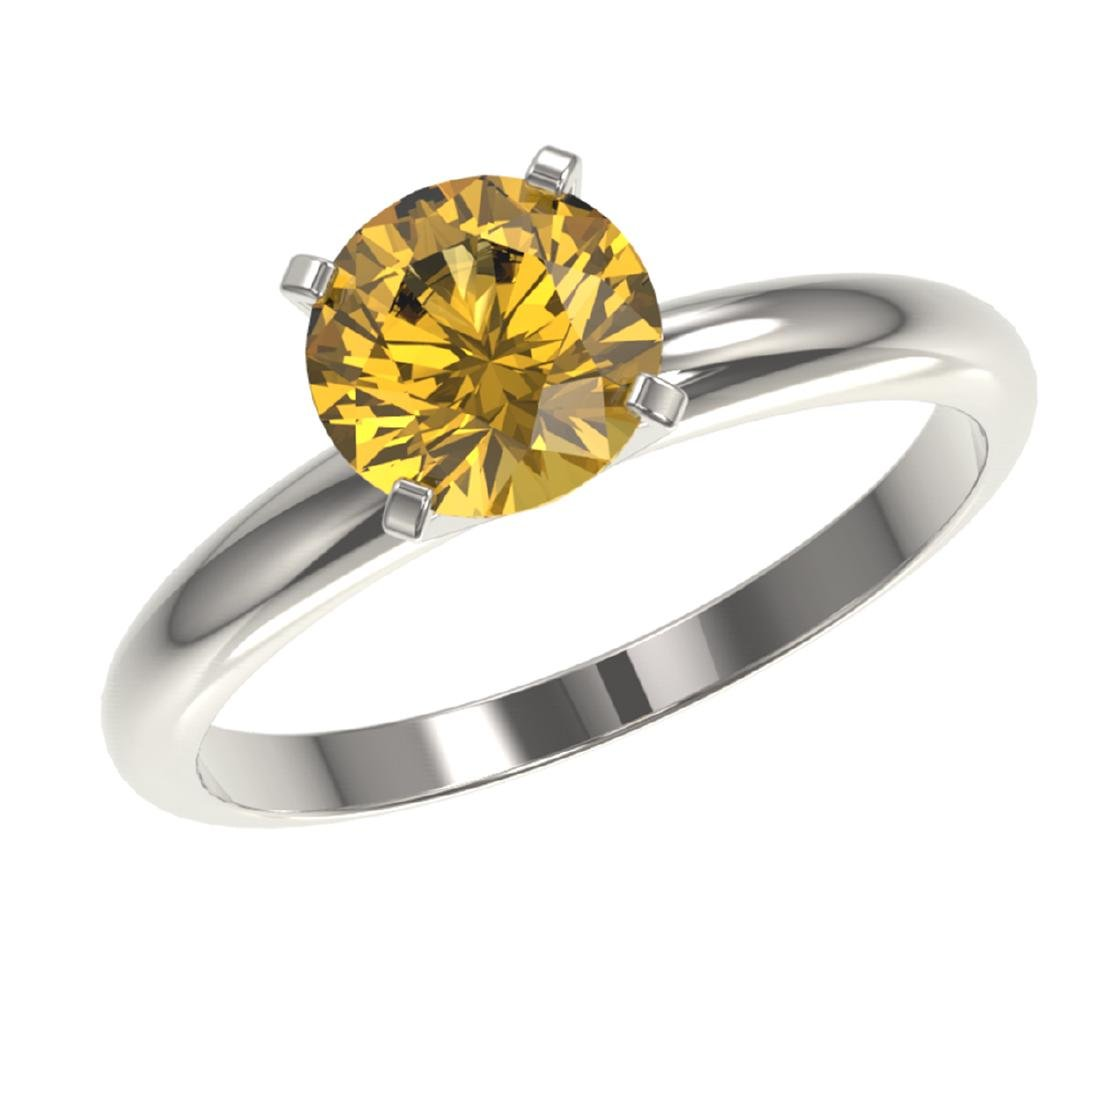 1.50 ctw Intense Yellow Diamond Solitaire Ring 10K - 2